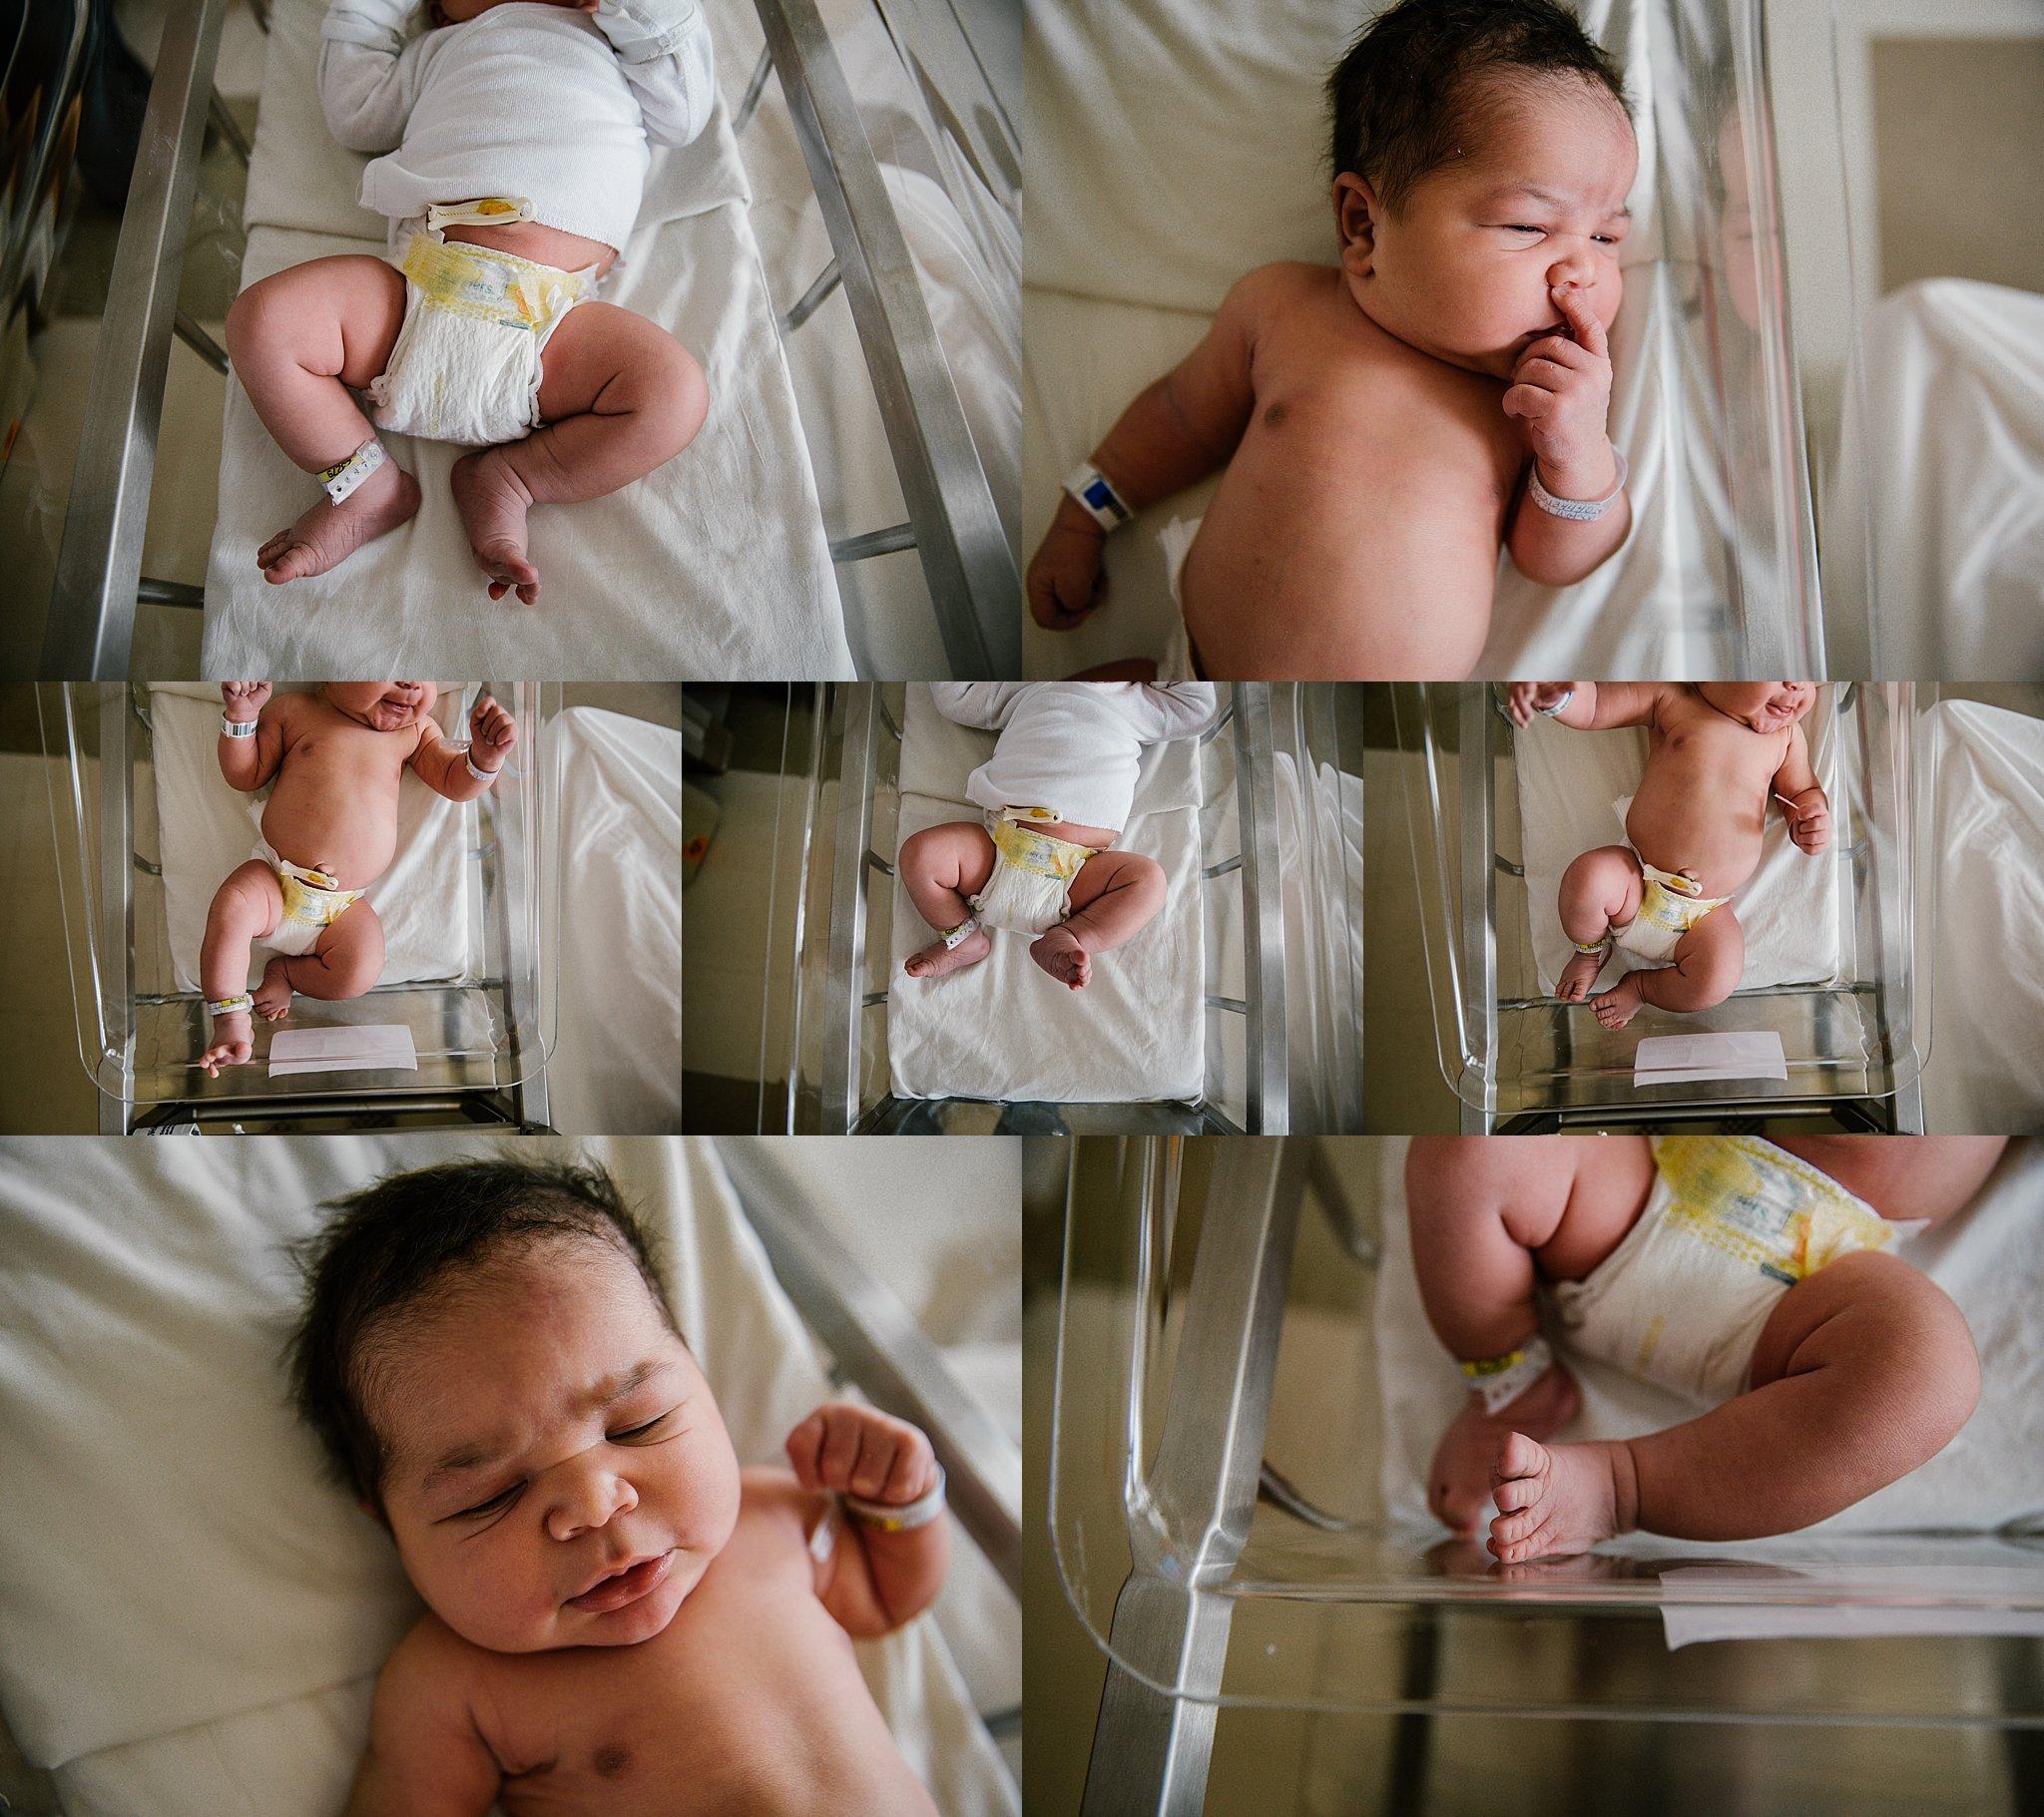 20180310-lake-regional-camdenton-hospital-newborn-picture-best-baby-photographer-missouri-osage-beach-02.jpg